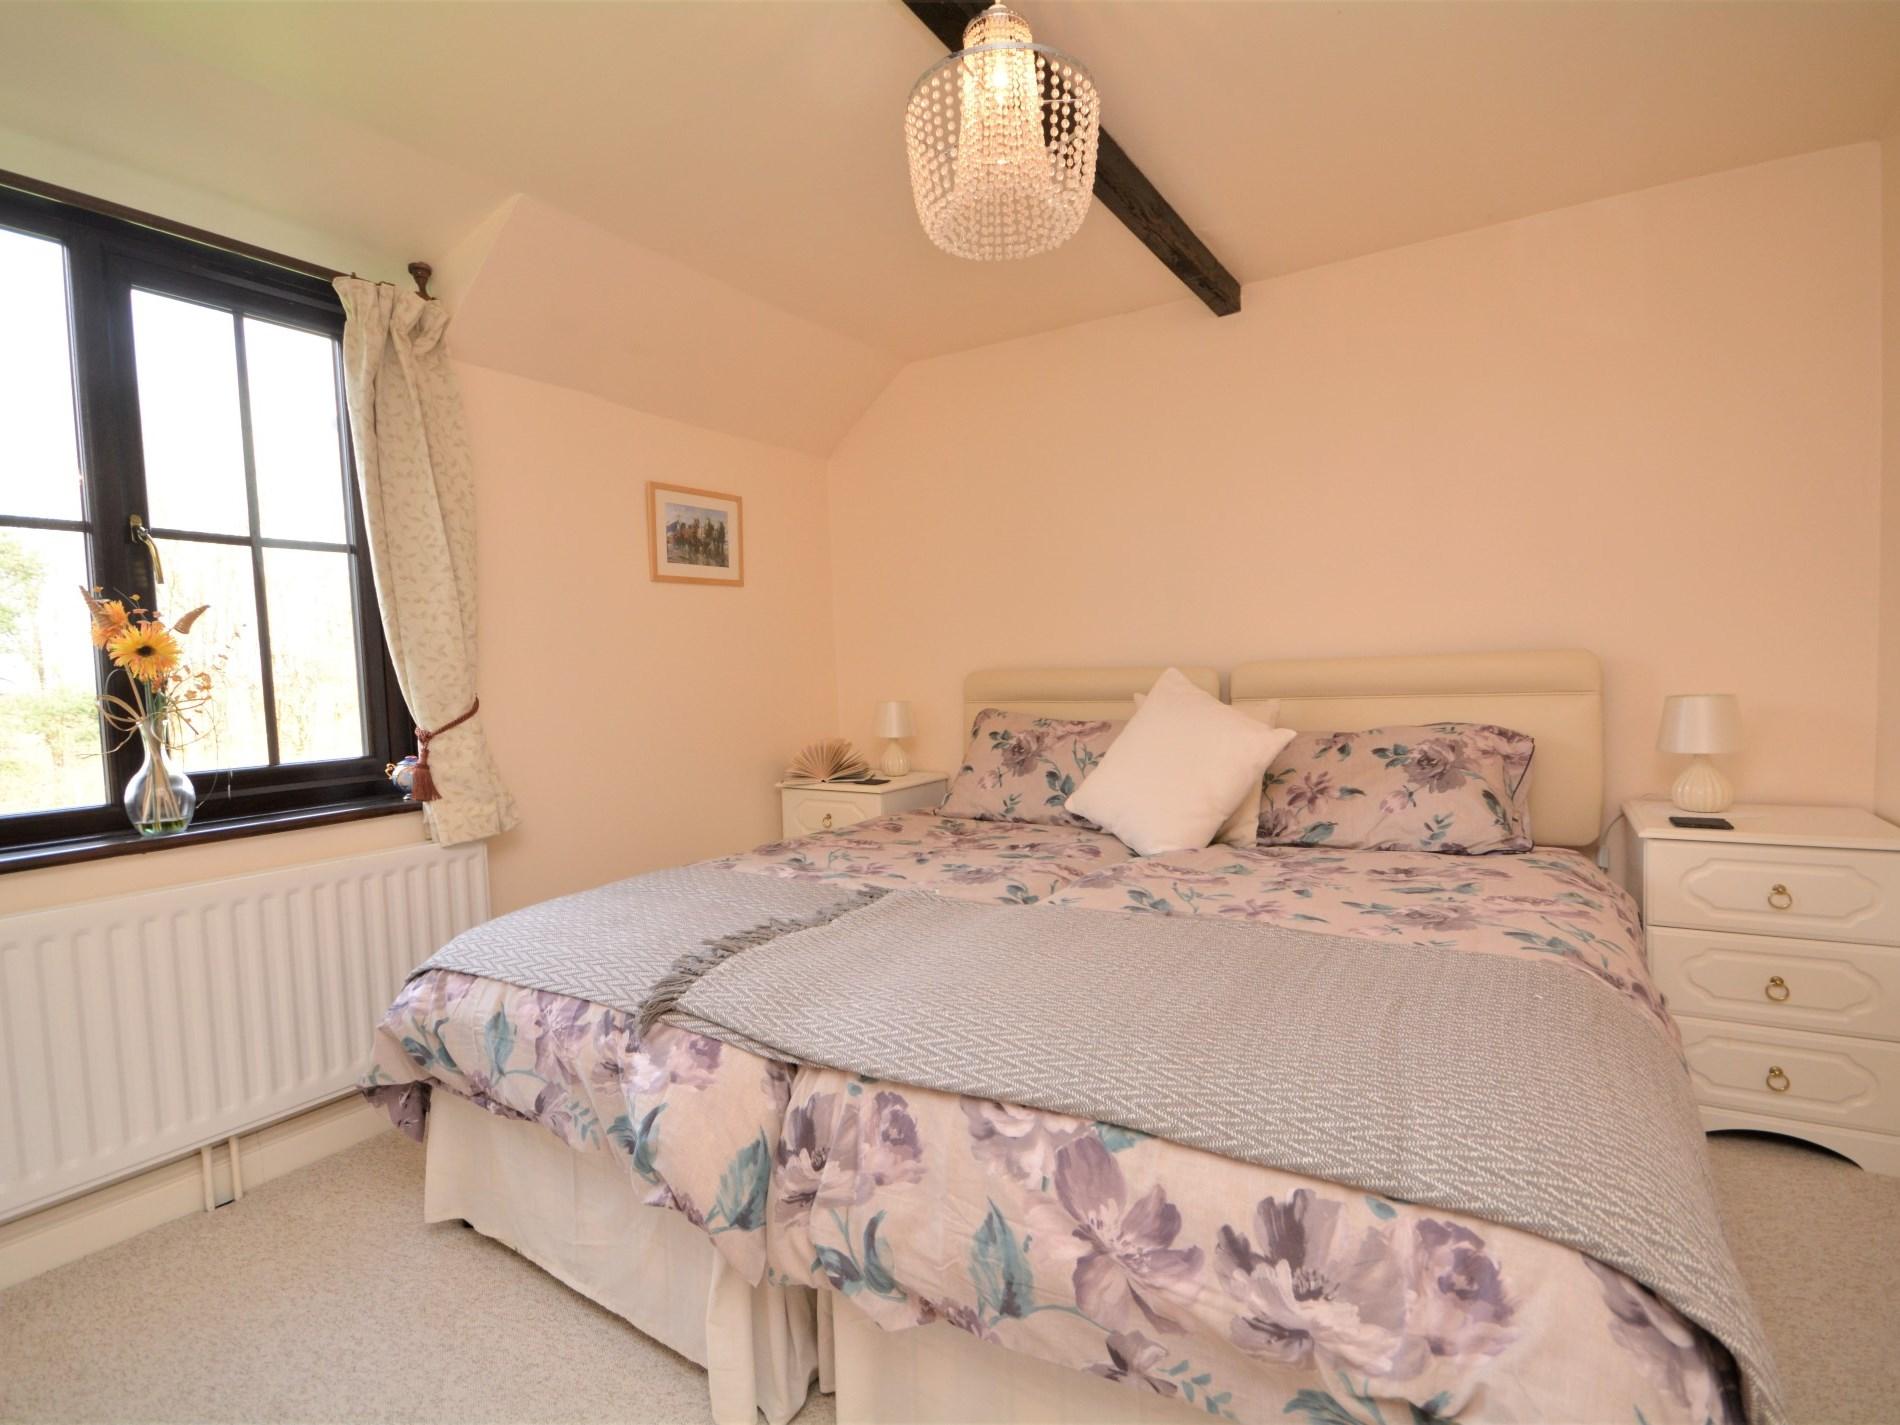 1 Bedroom Cottage in Launceston, Cornwall